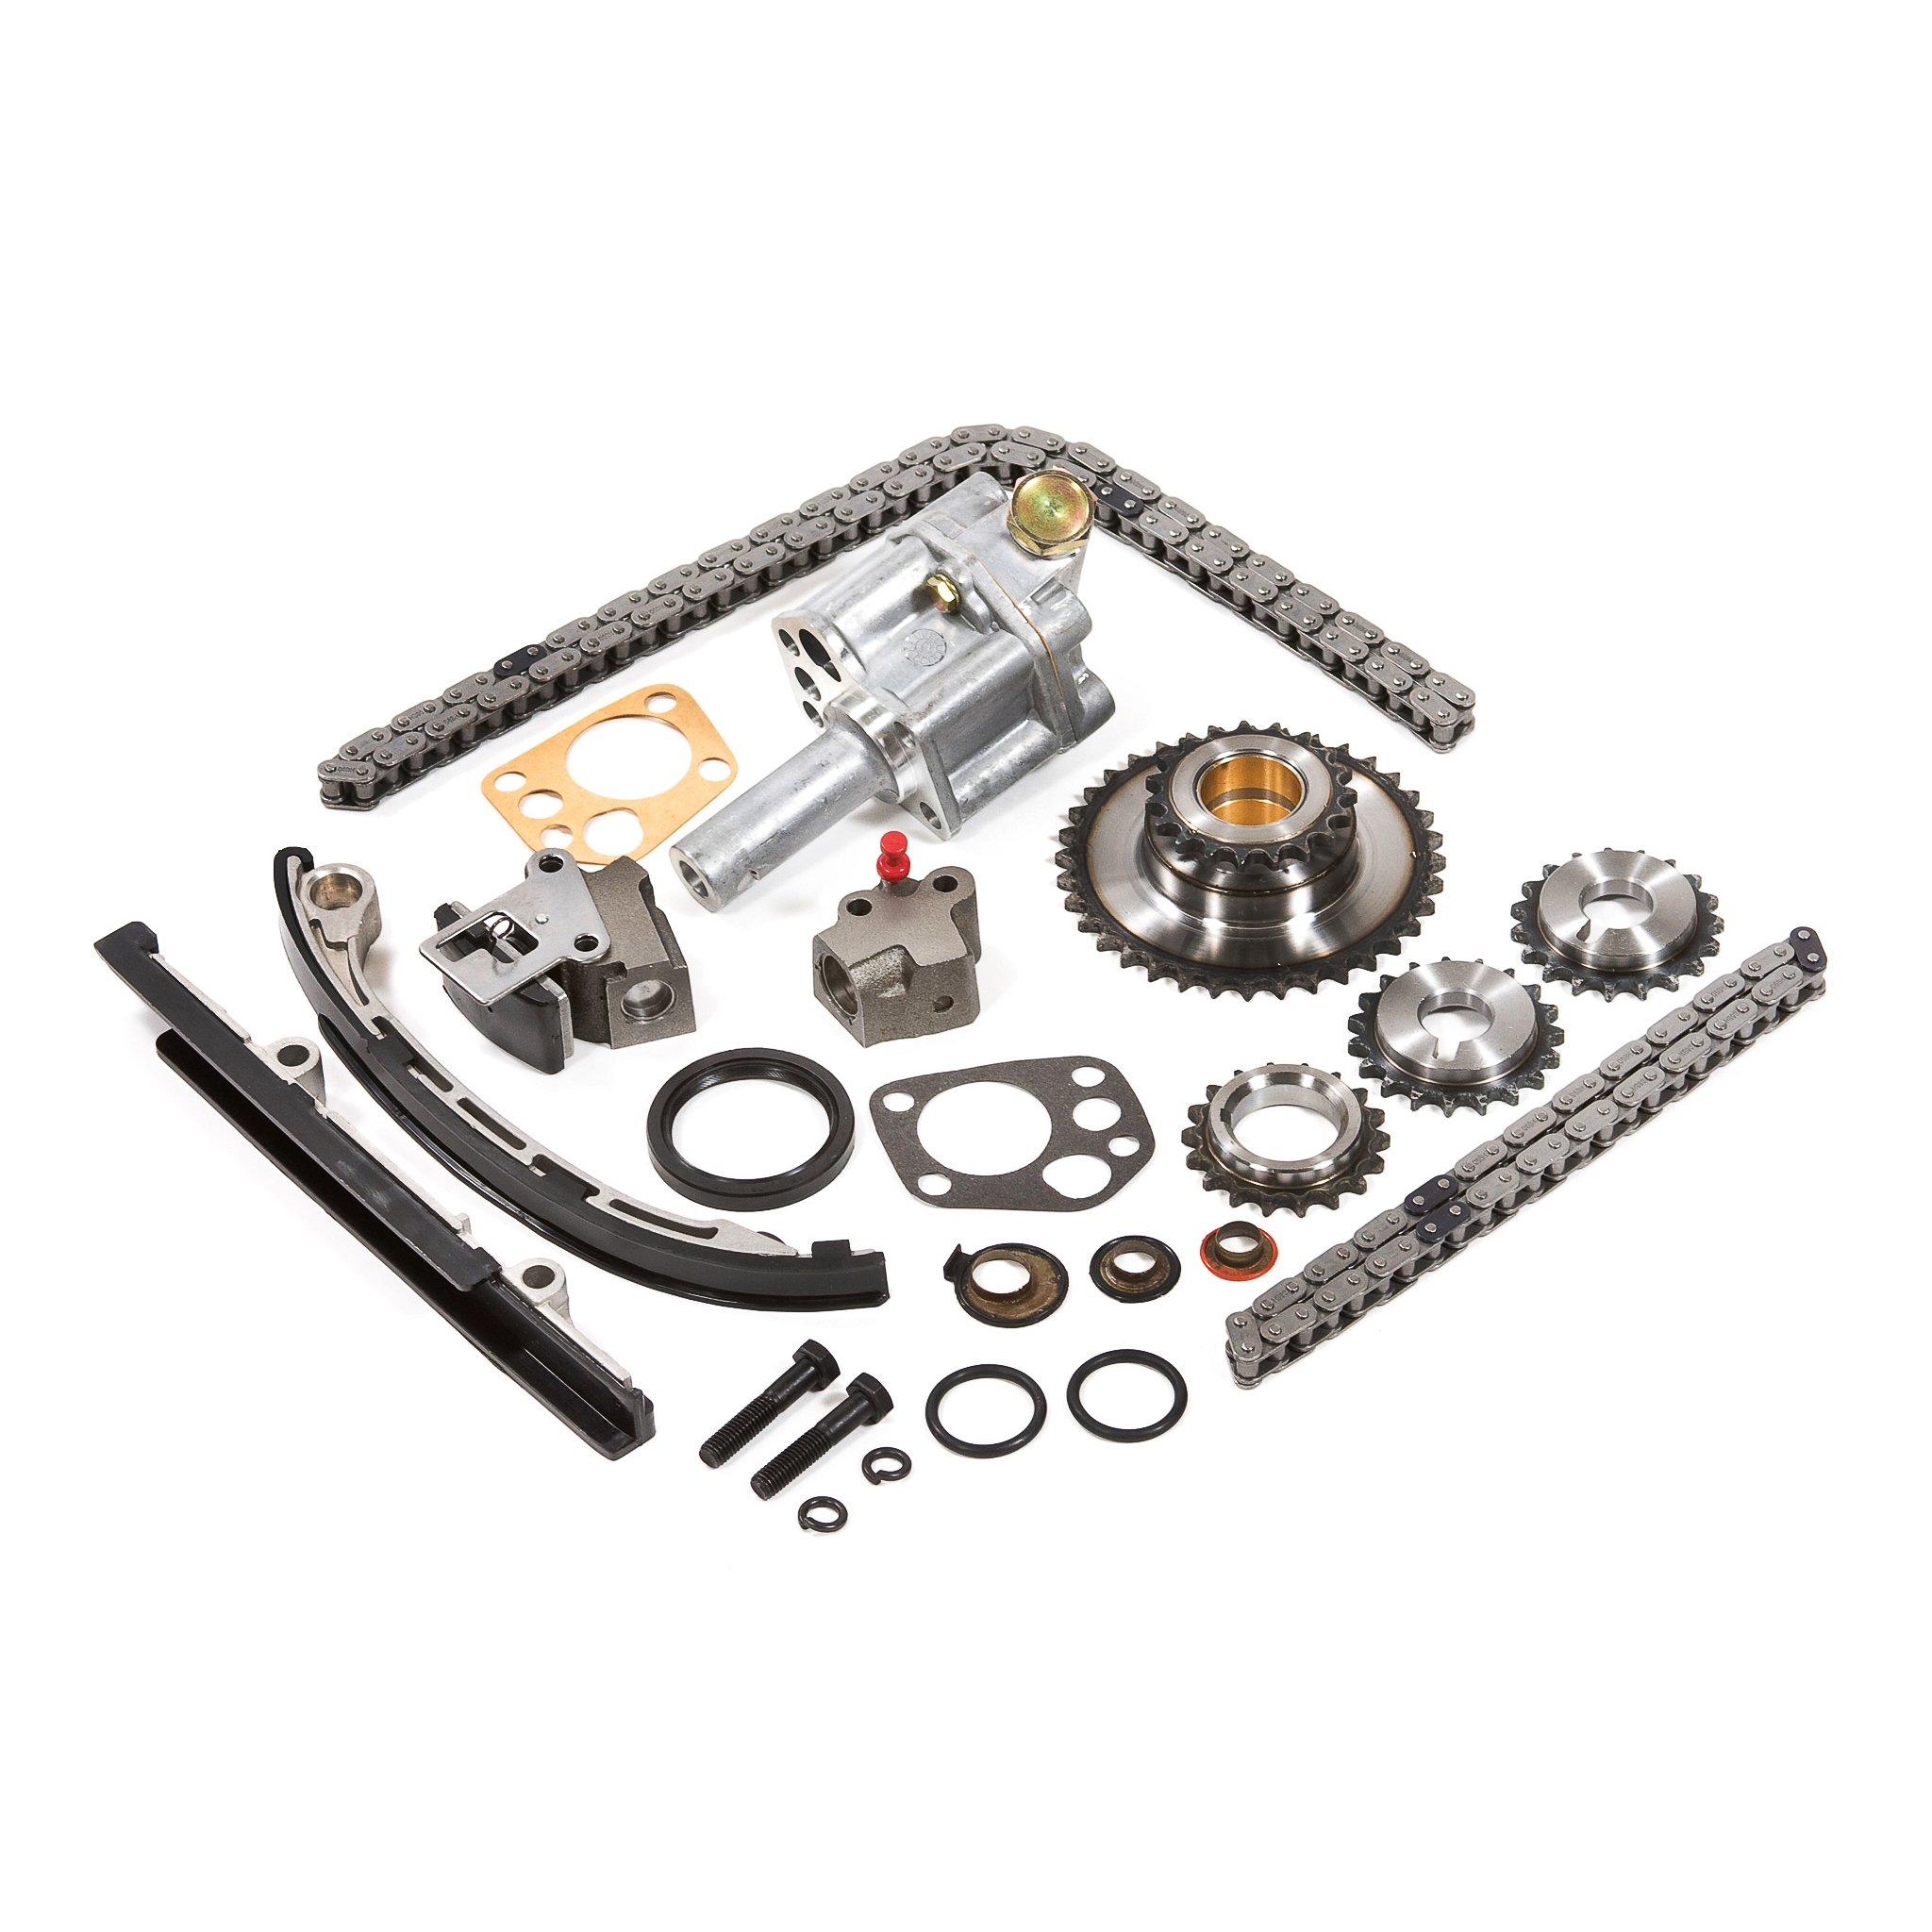 Nissan Timing Chain Kit